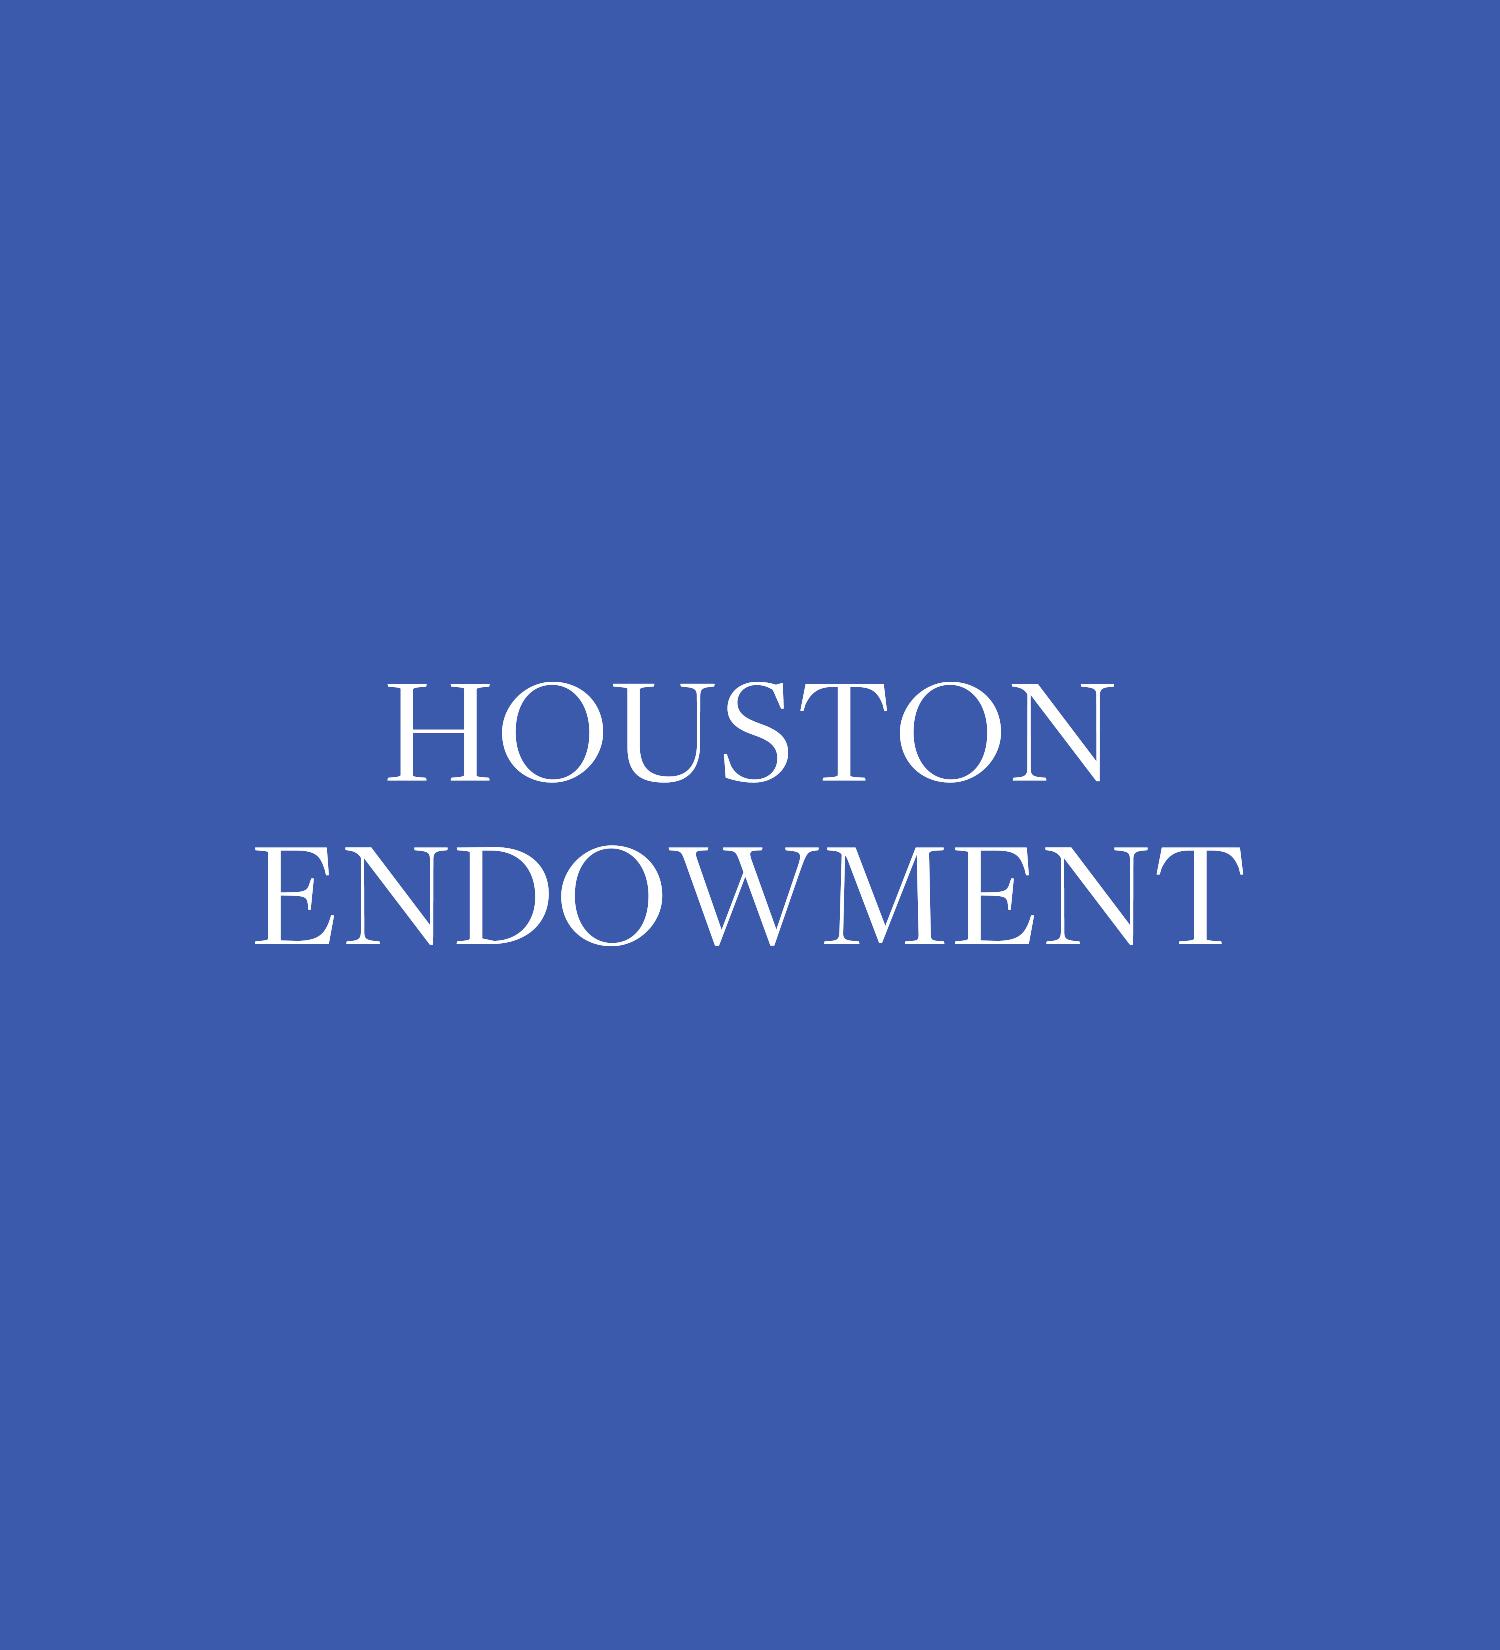 Copy of Houston Endowment